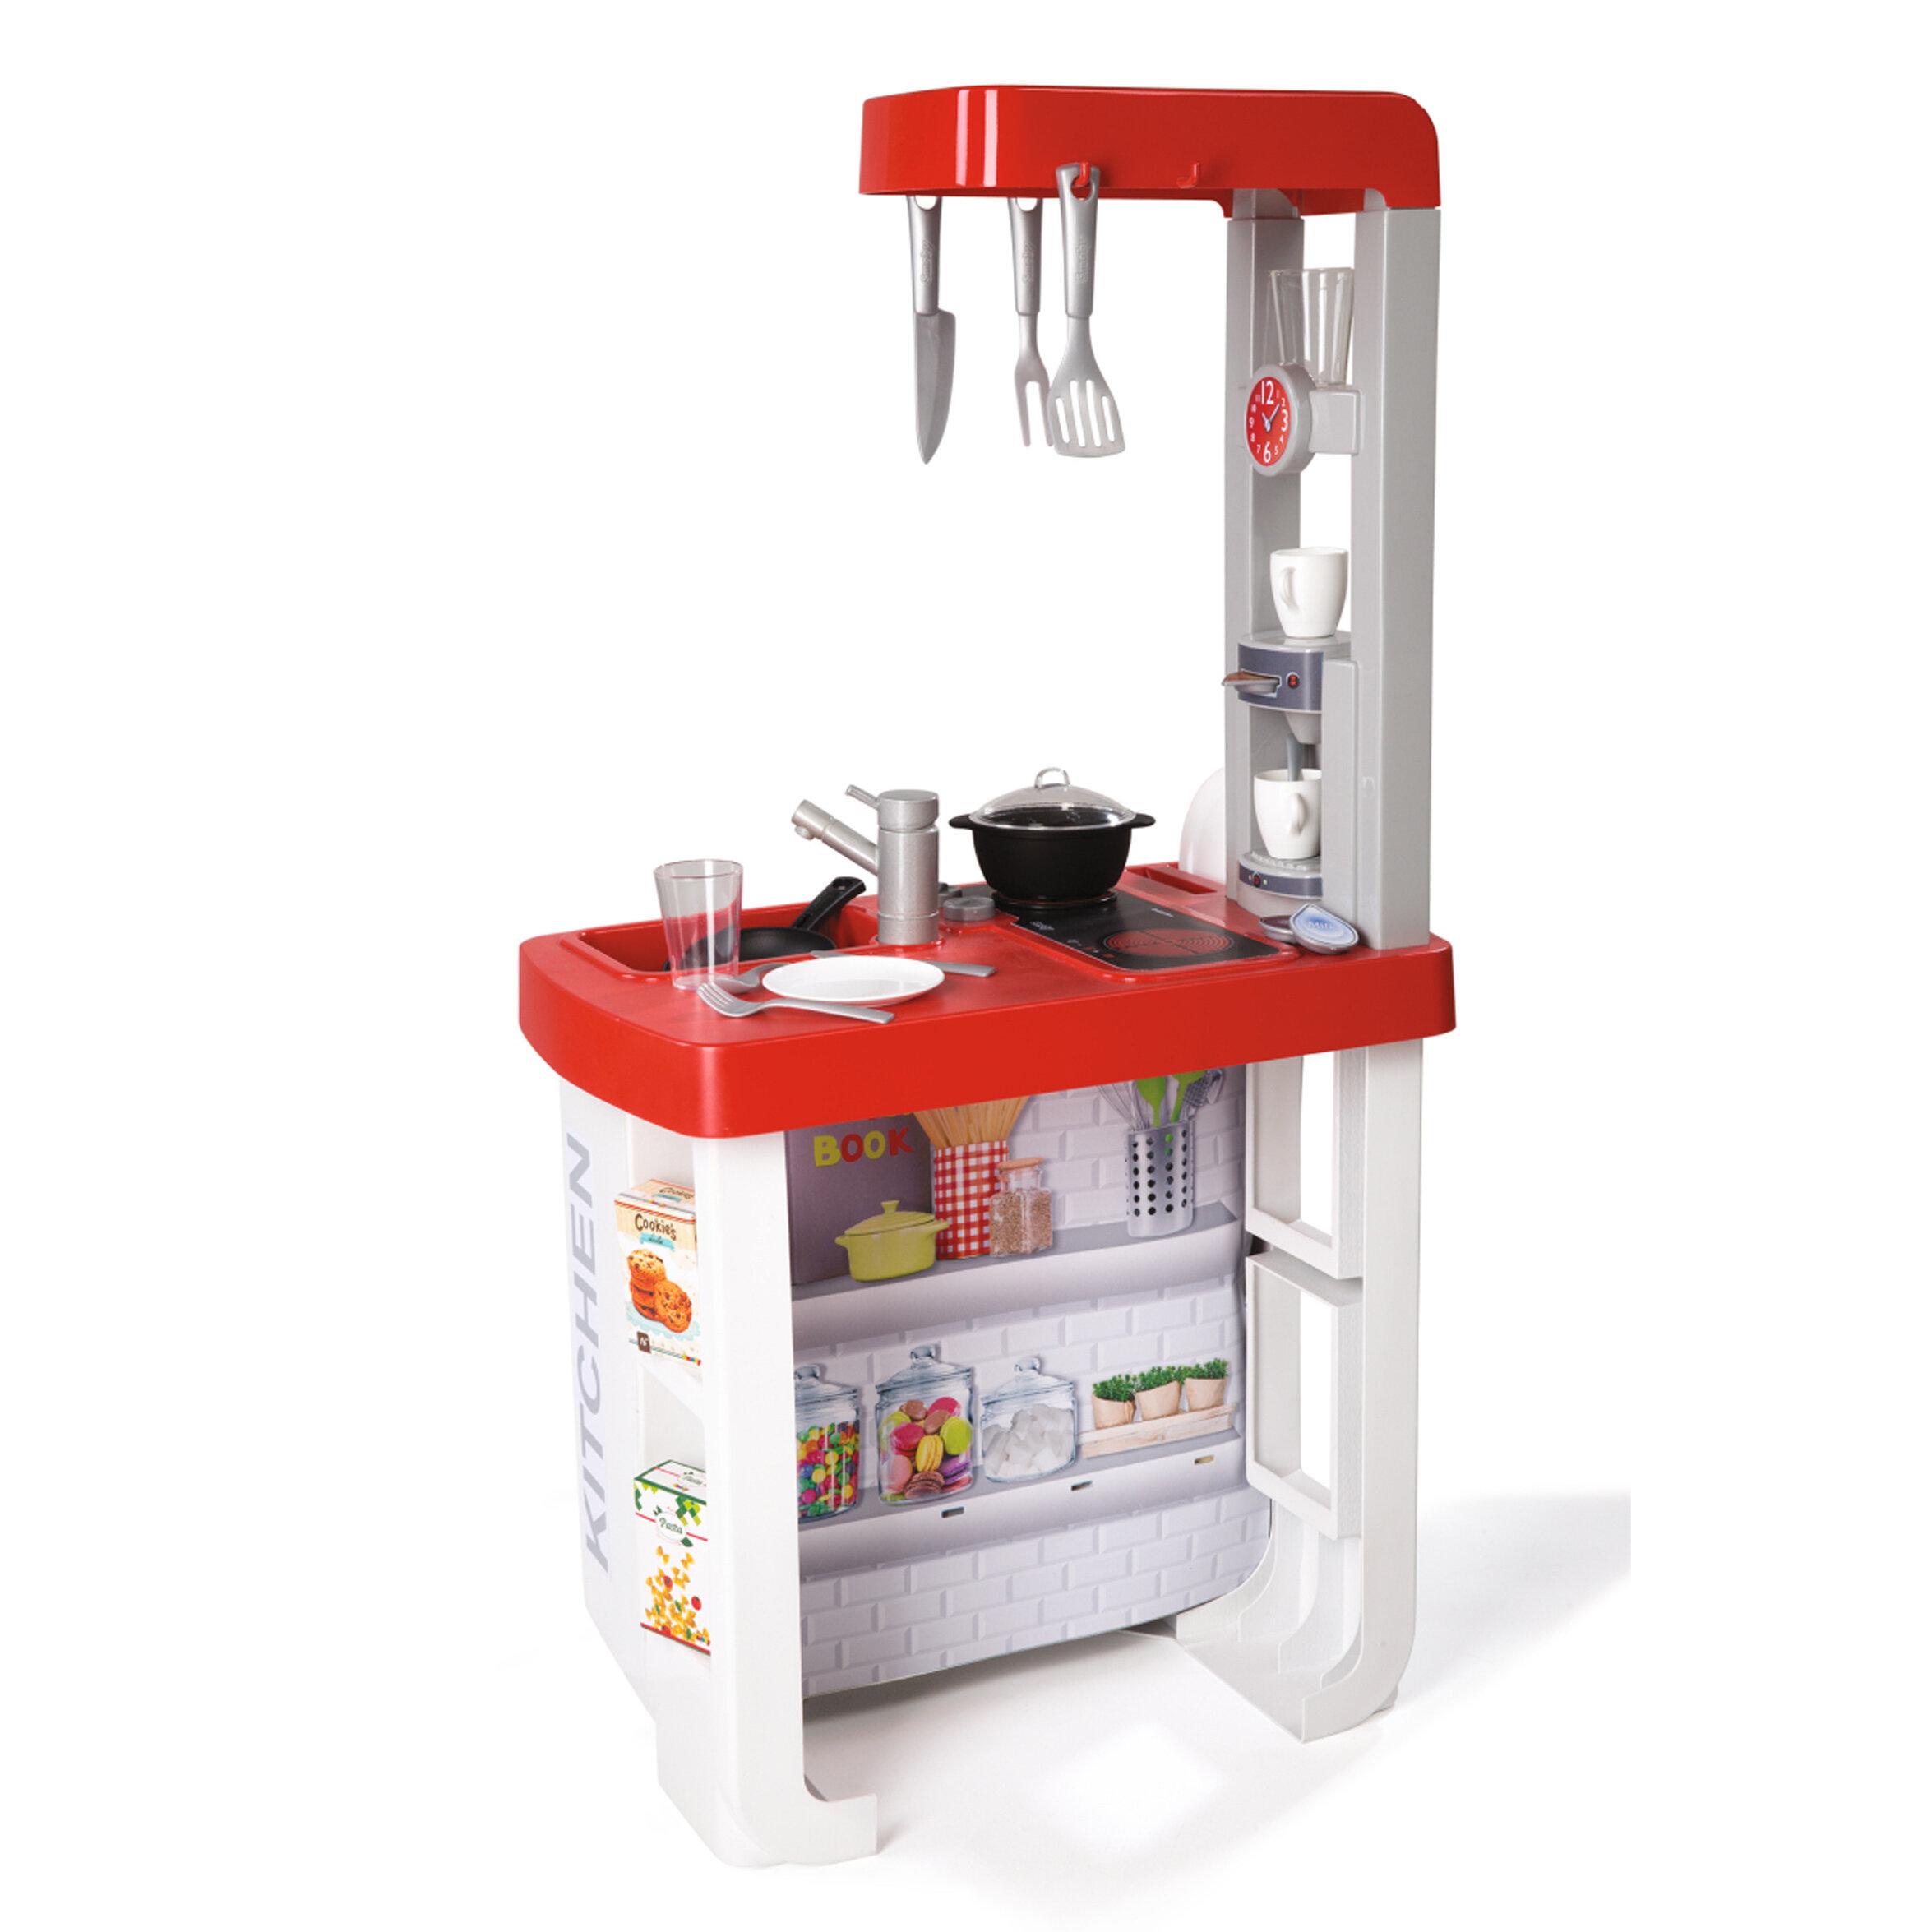 Smoby Electronic Play Kitchen Set Wayfair